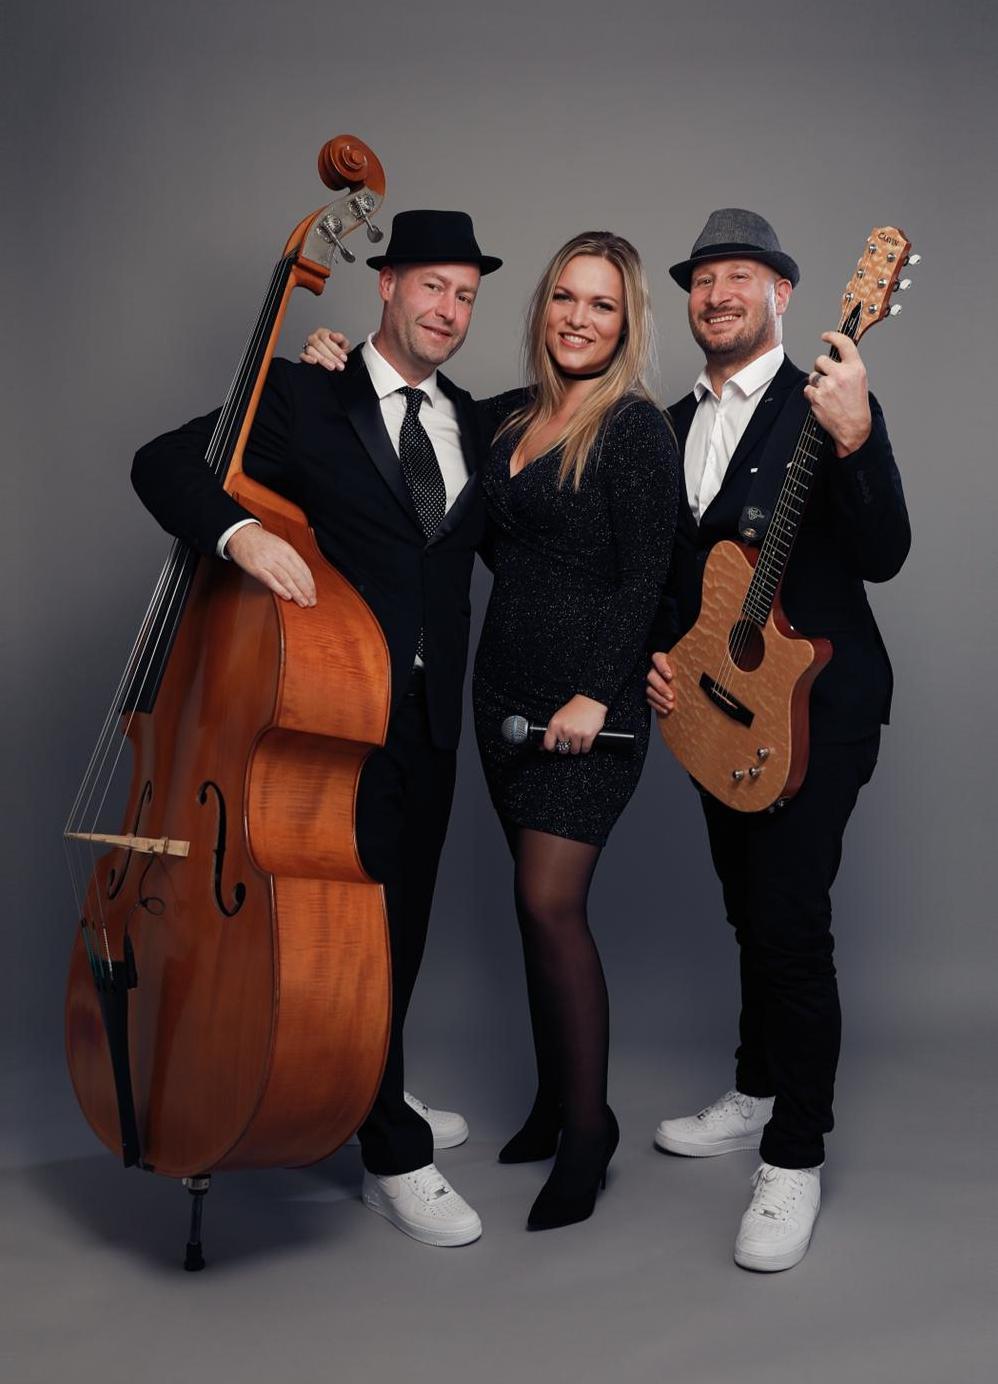 Acoustic bandits Jonny Smokes Sophie Mol Maurits Malherbe life muziek lifemusic